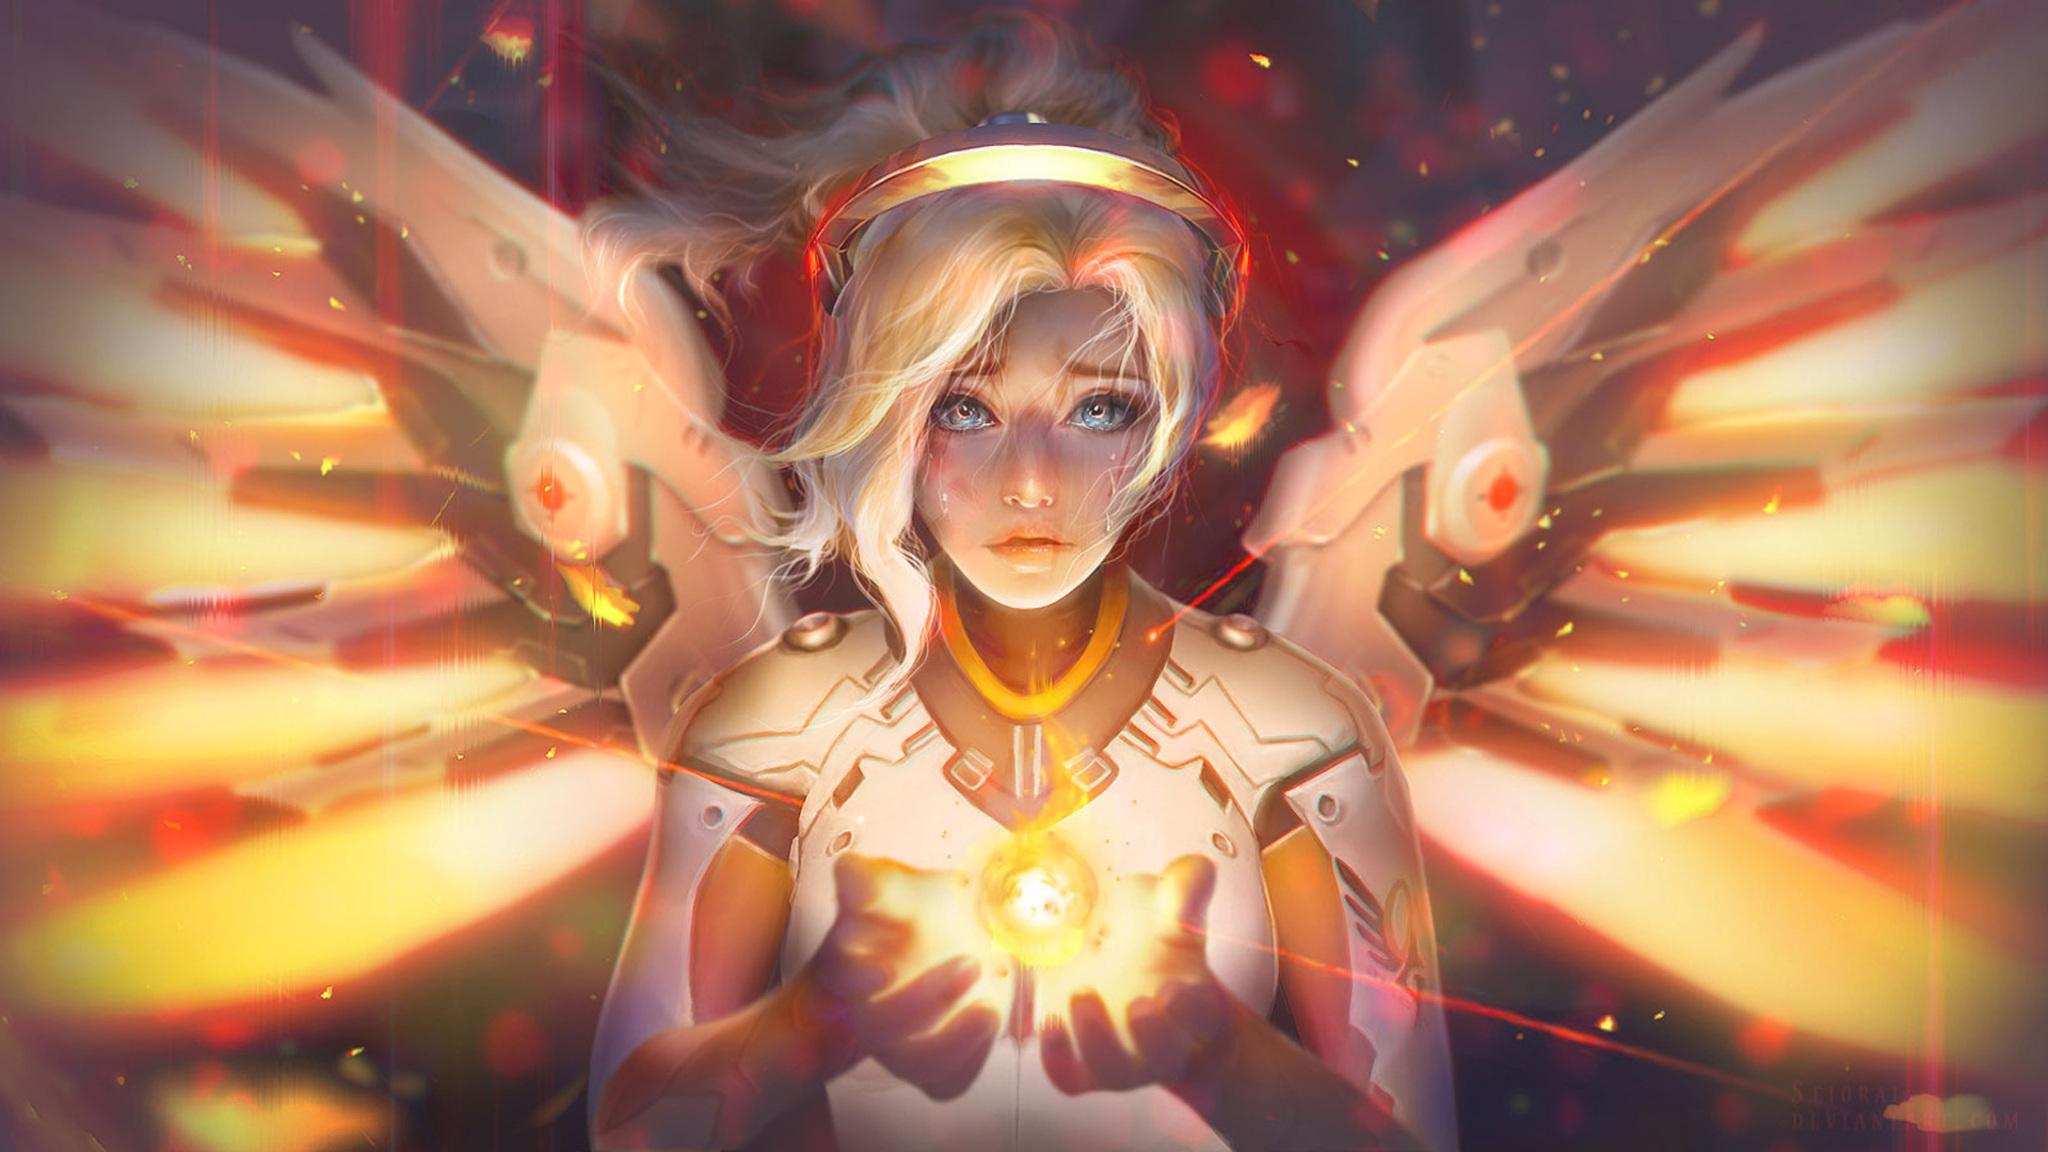 mercy-angel-overwatch-fantasy-9u.jpg